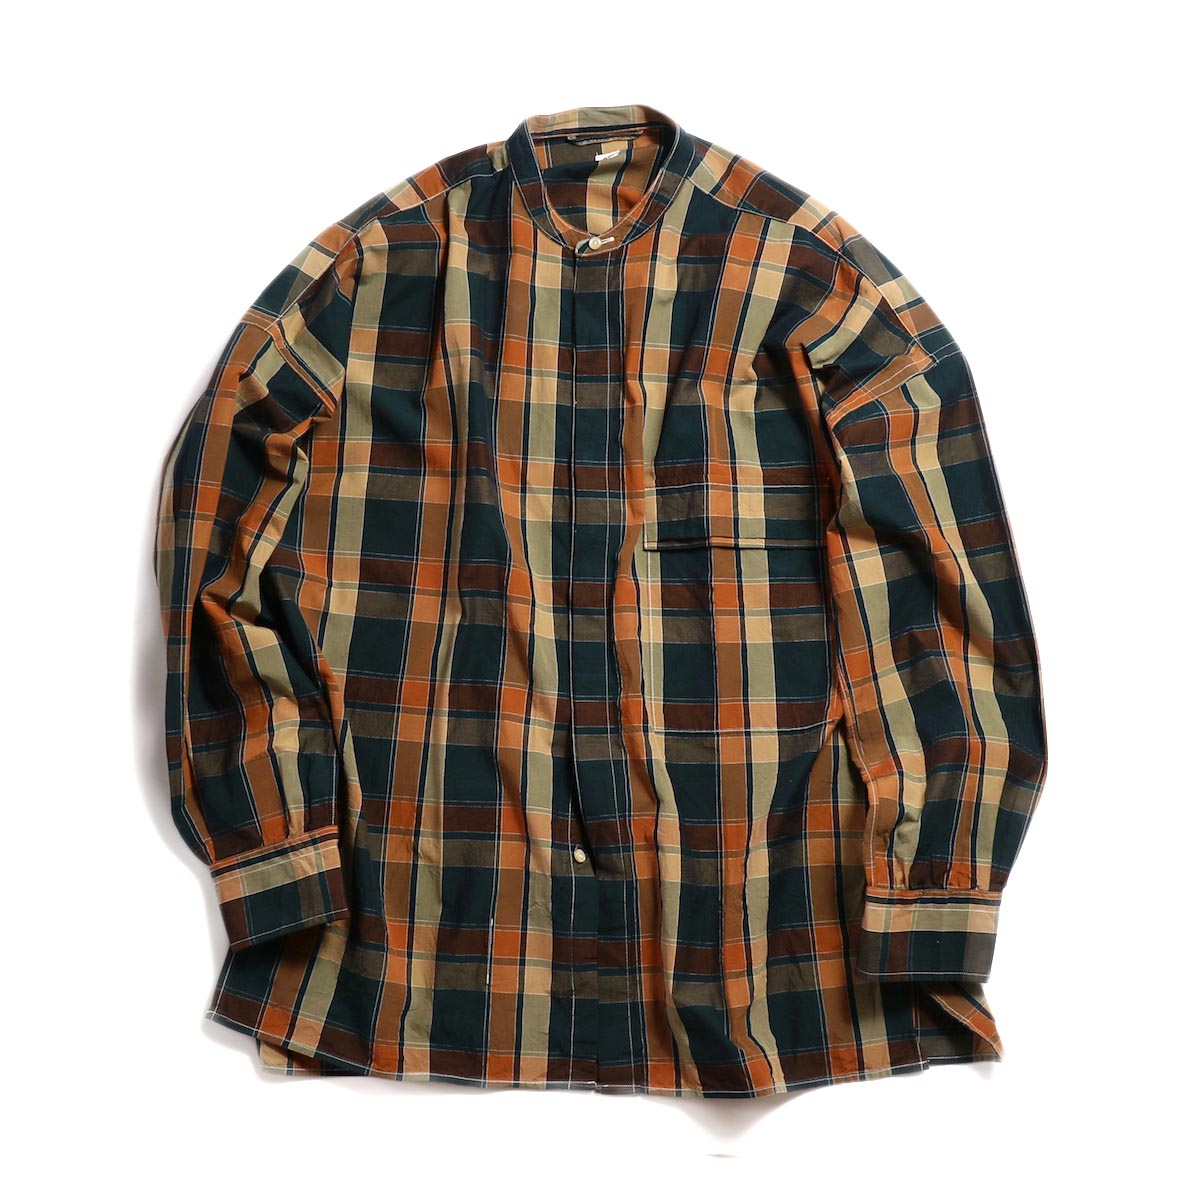 Kaptain Sunshine / Fly Front Band Collar Shirt -Brown Check